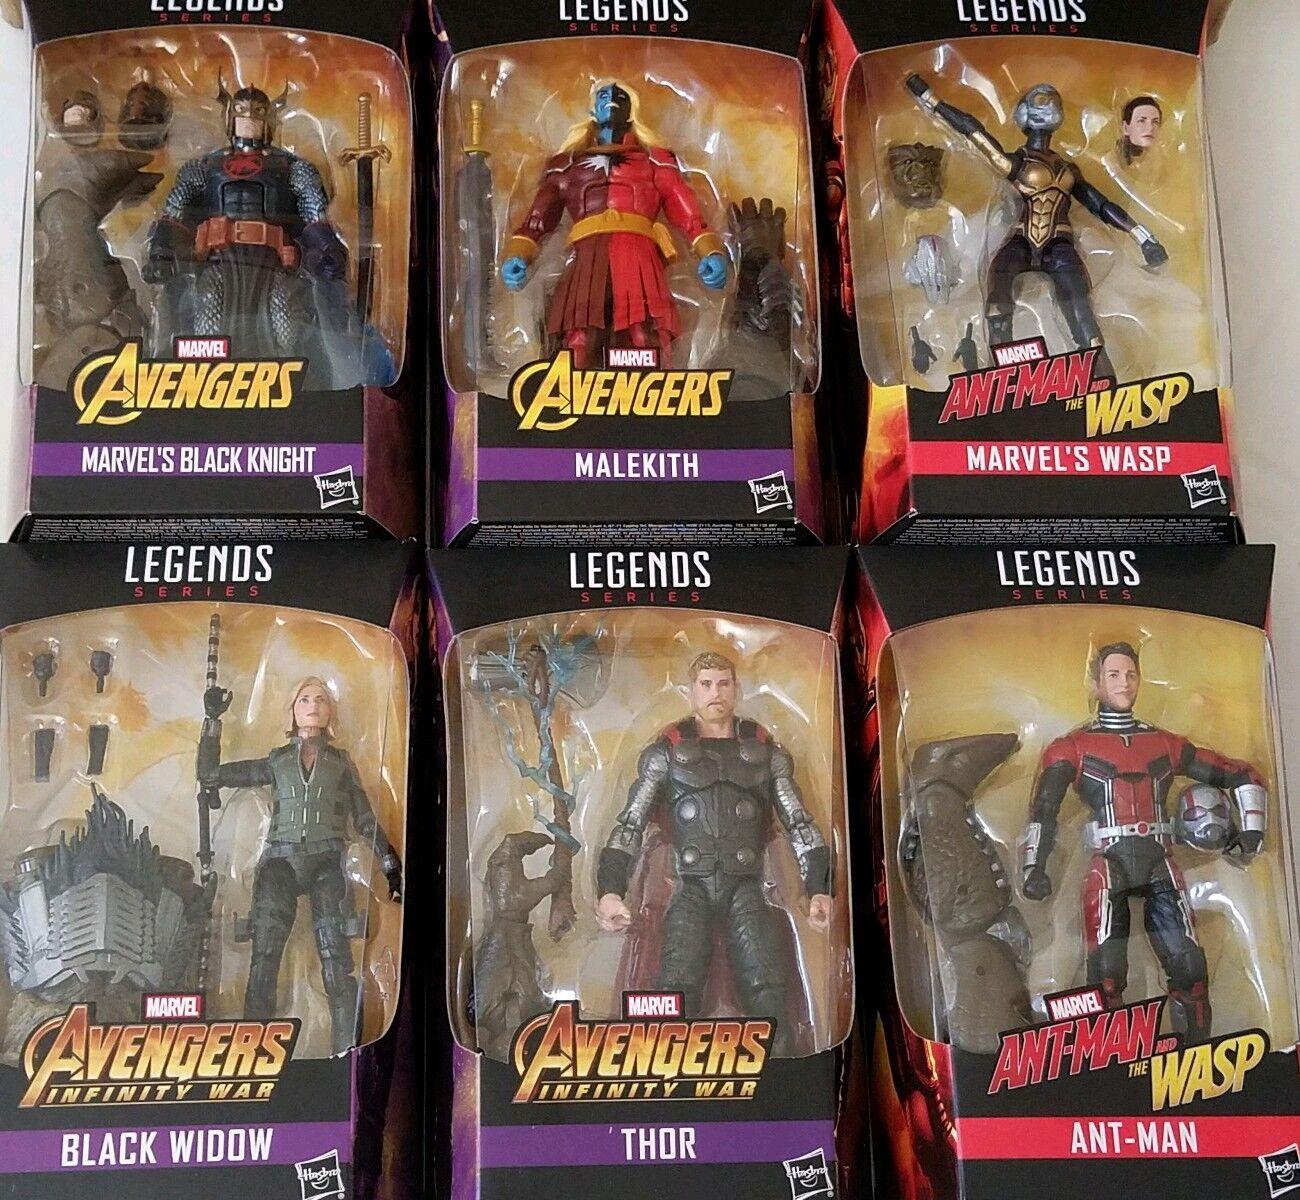 Marvel avengers keulen legenden obsidian baf satz von 6 mb geliefert, in der fabrik - fall